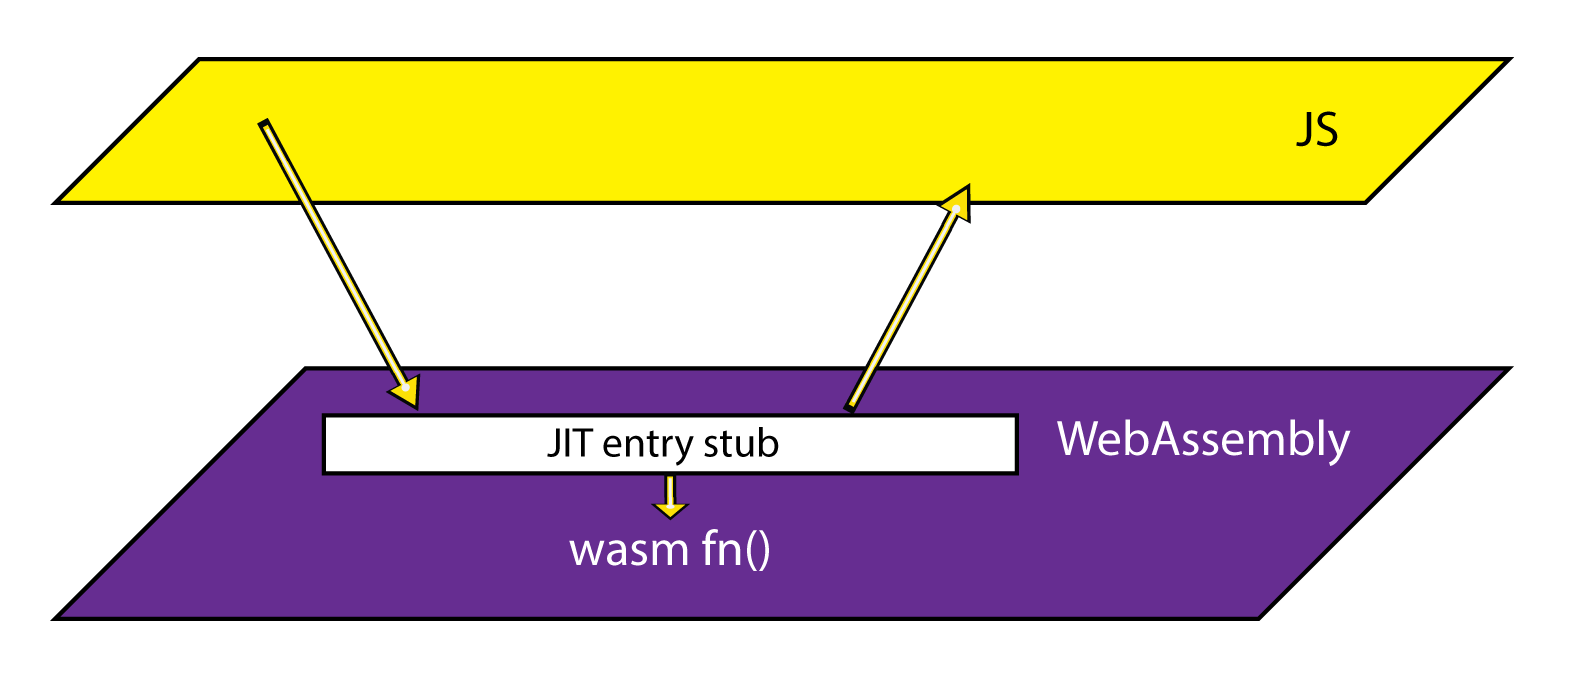 Diagram showing JIT entry stub